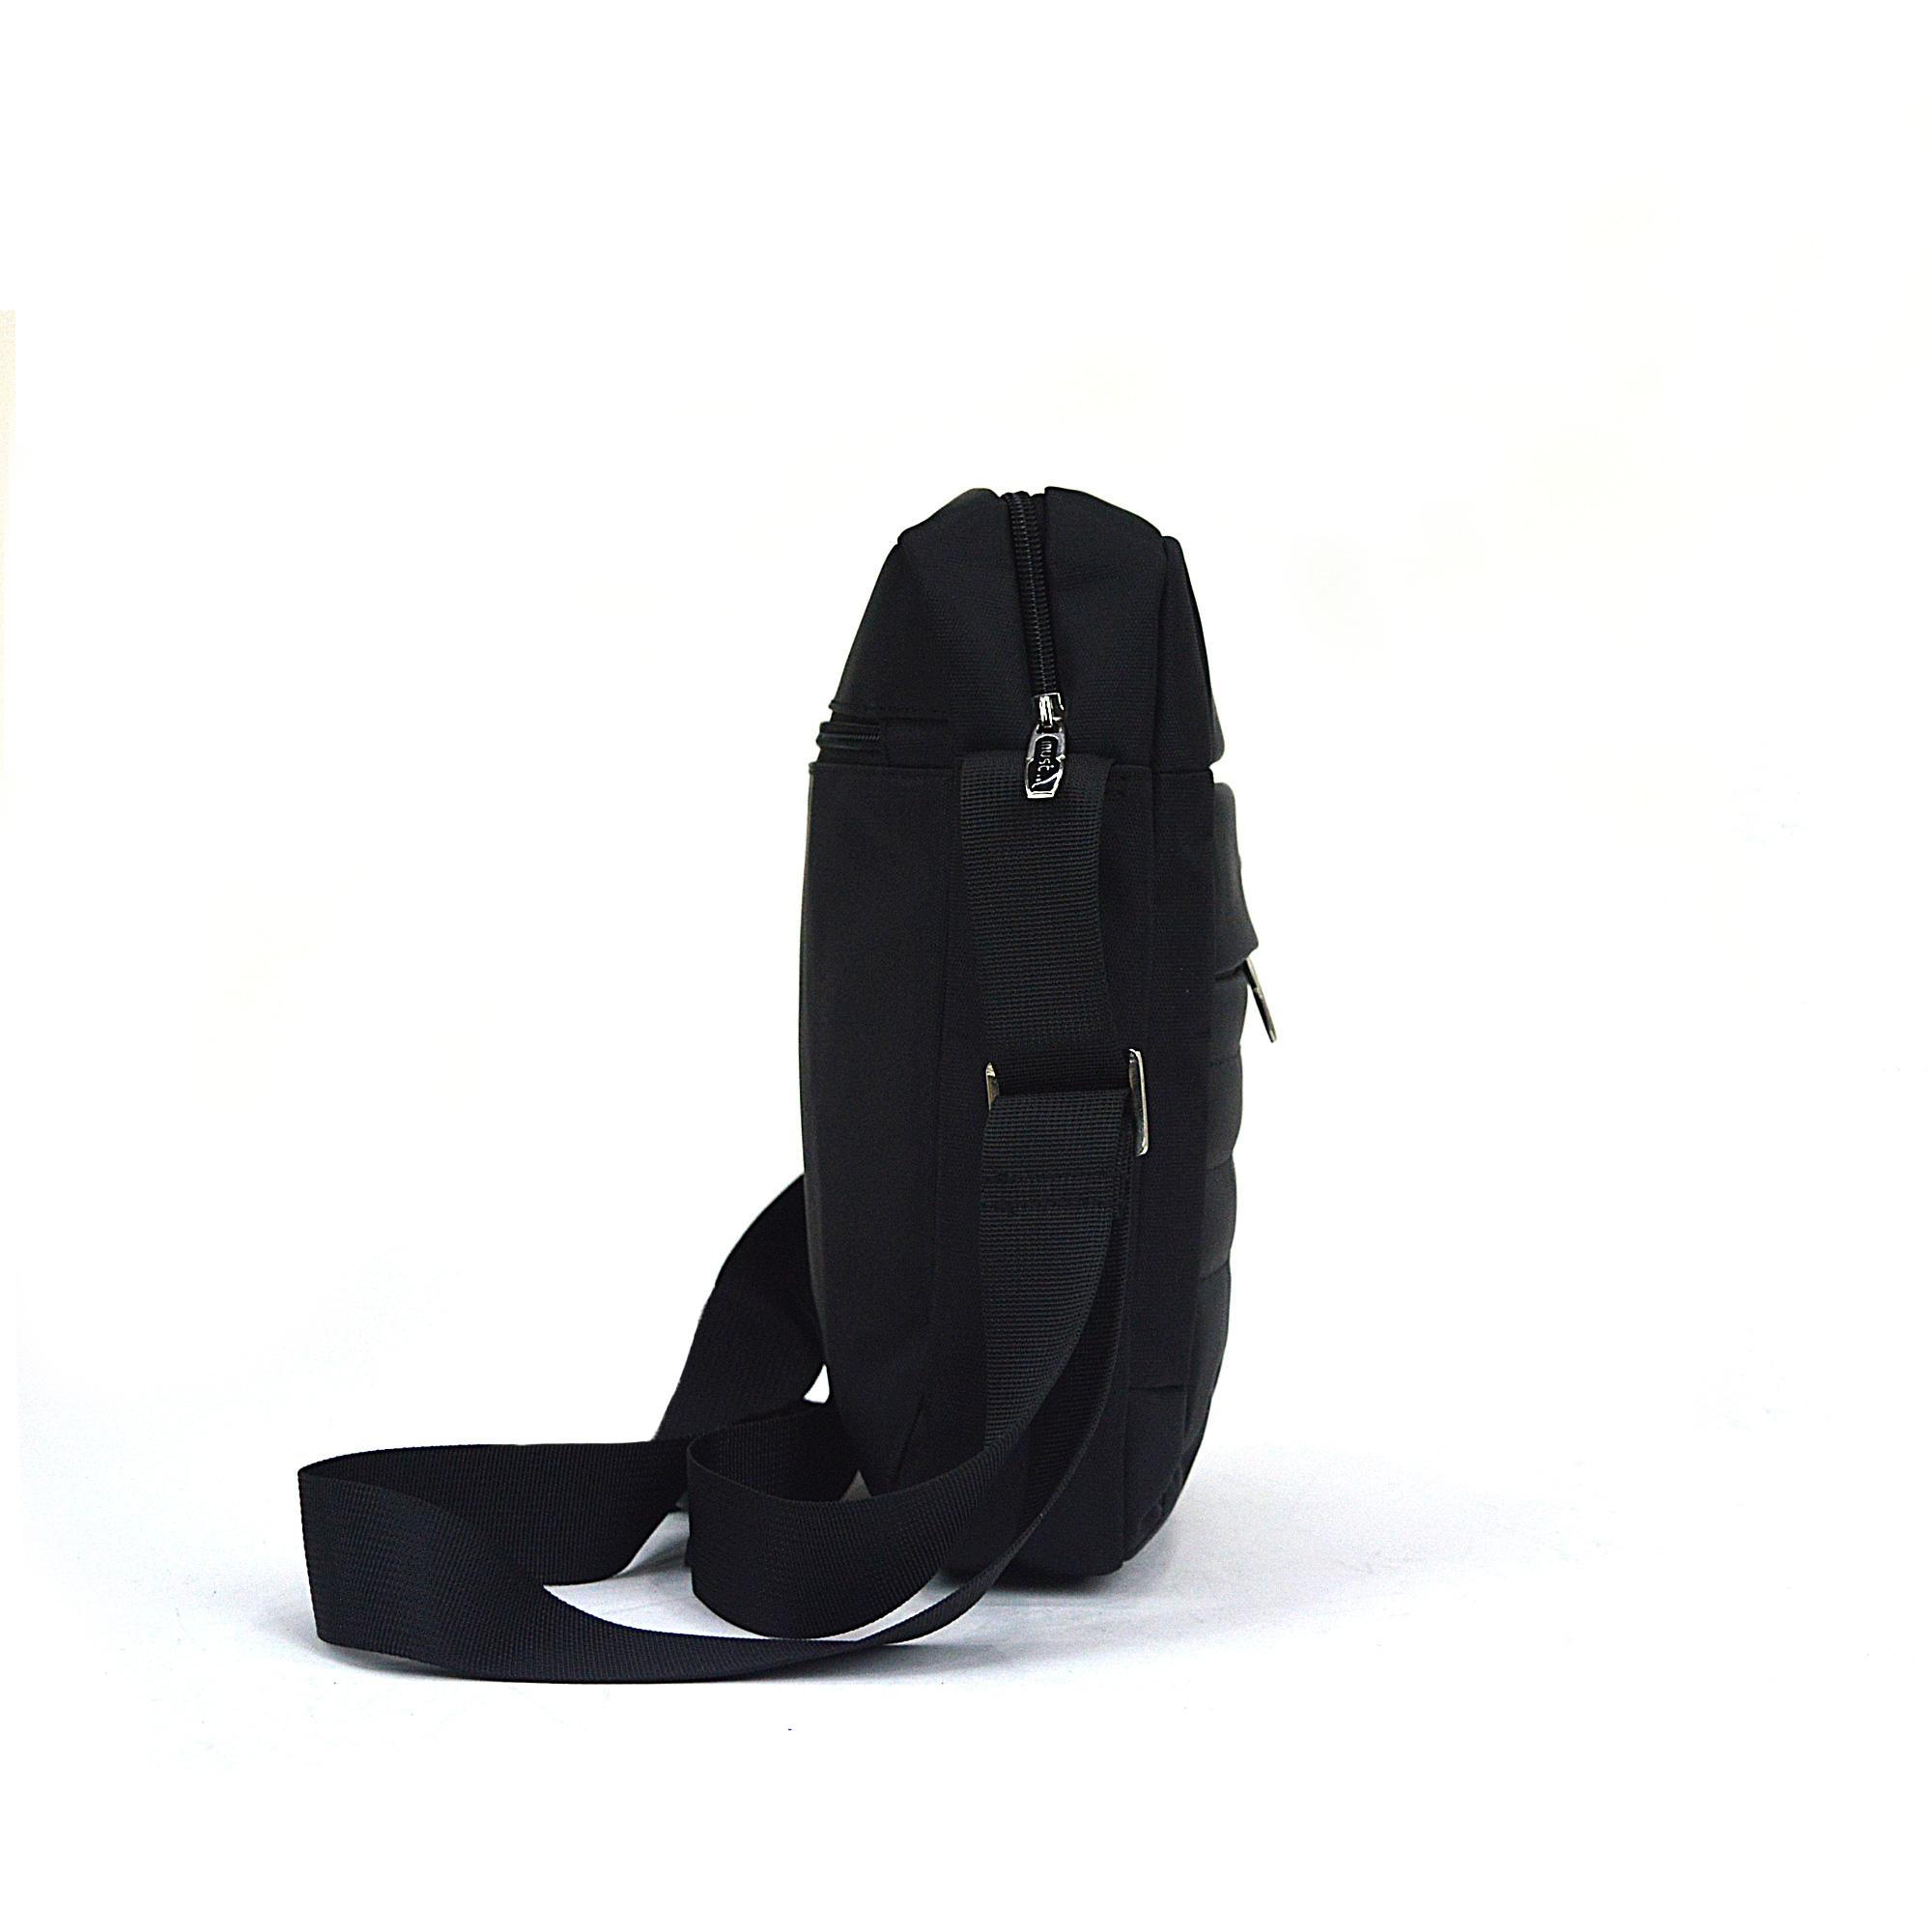 1f1cf70e10 ΤΣΑΝΤΑΚΙ ΩΜΟΥ ZITA 4L ΜΑΥΡΟ - Must BackPacks